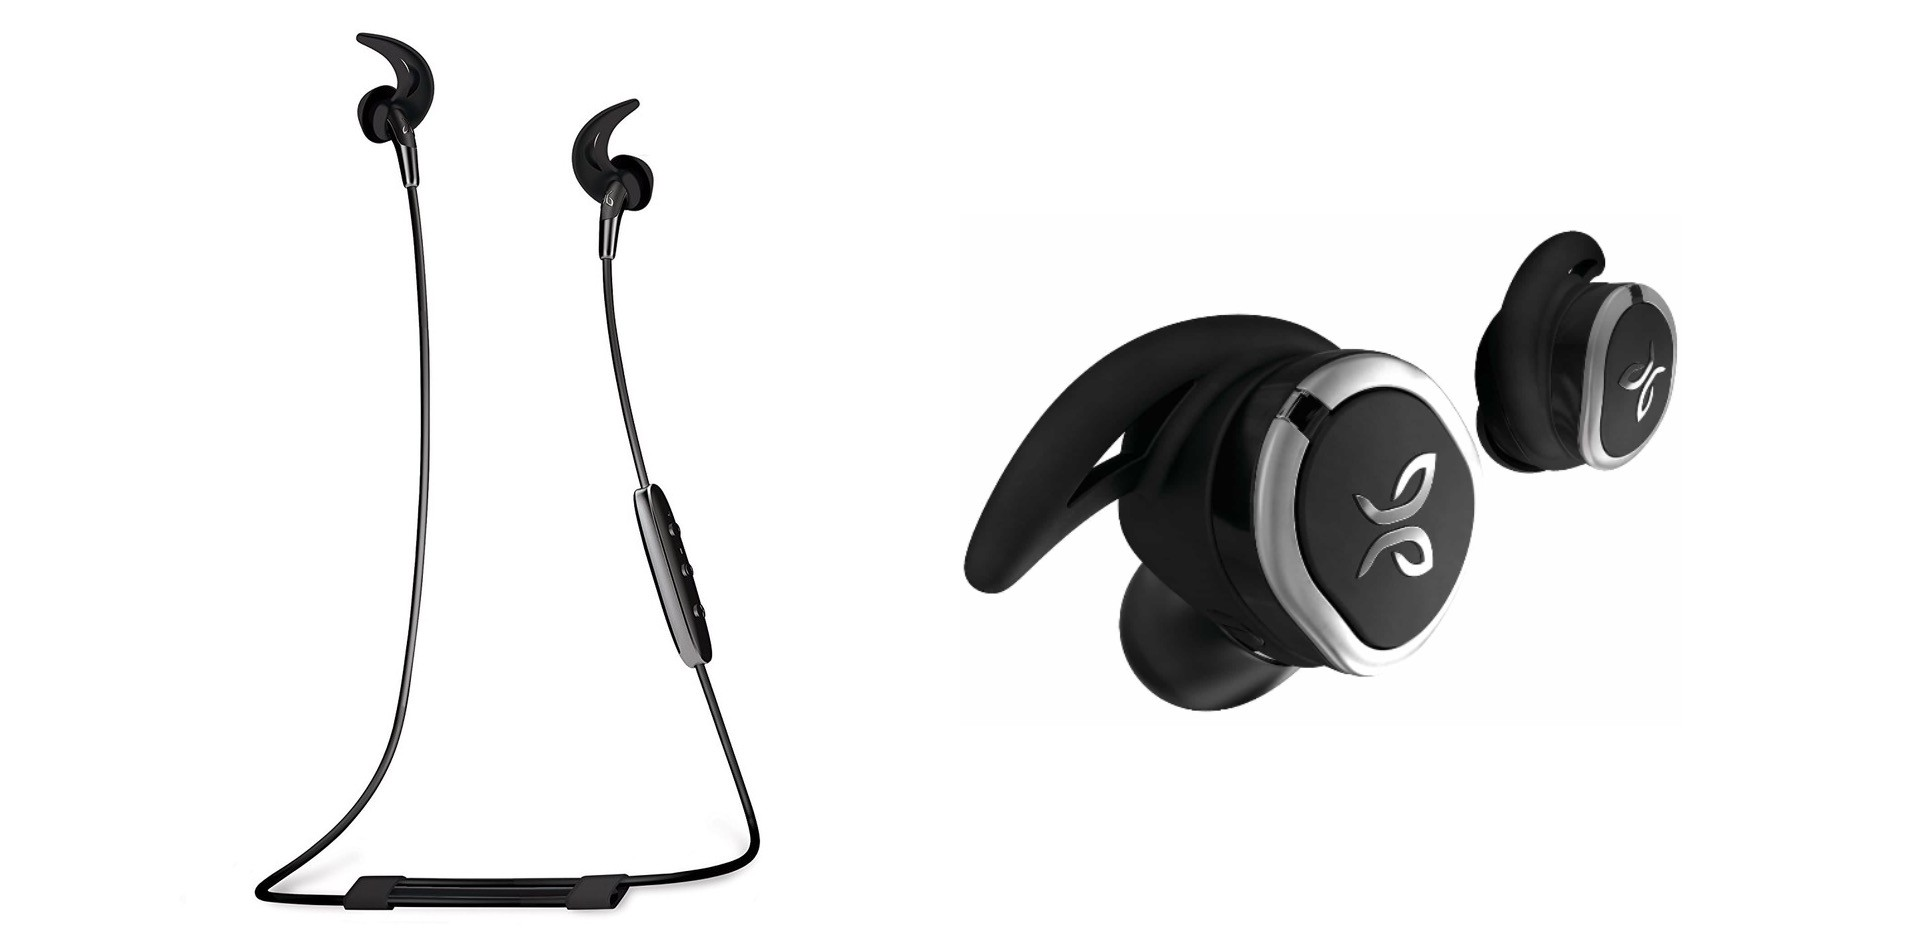 jaybird-run-and-freedom-2-wireless-earbuds